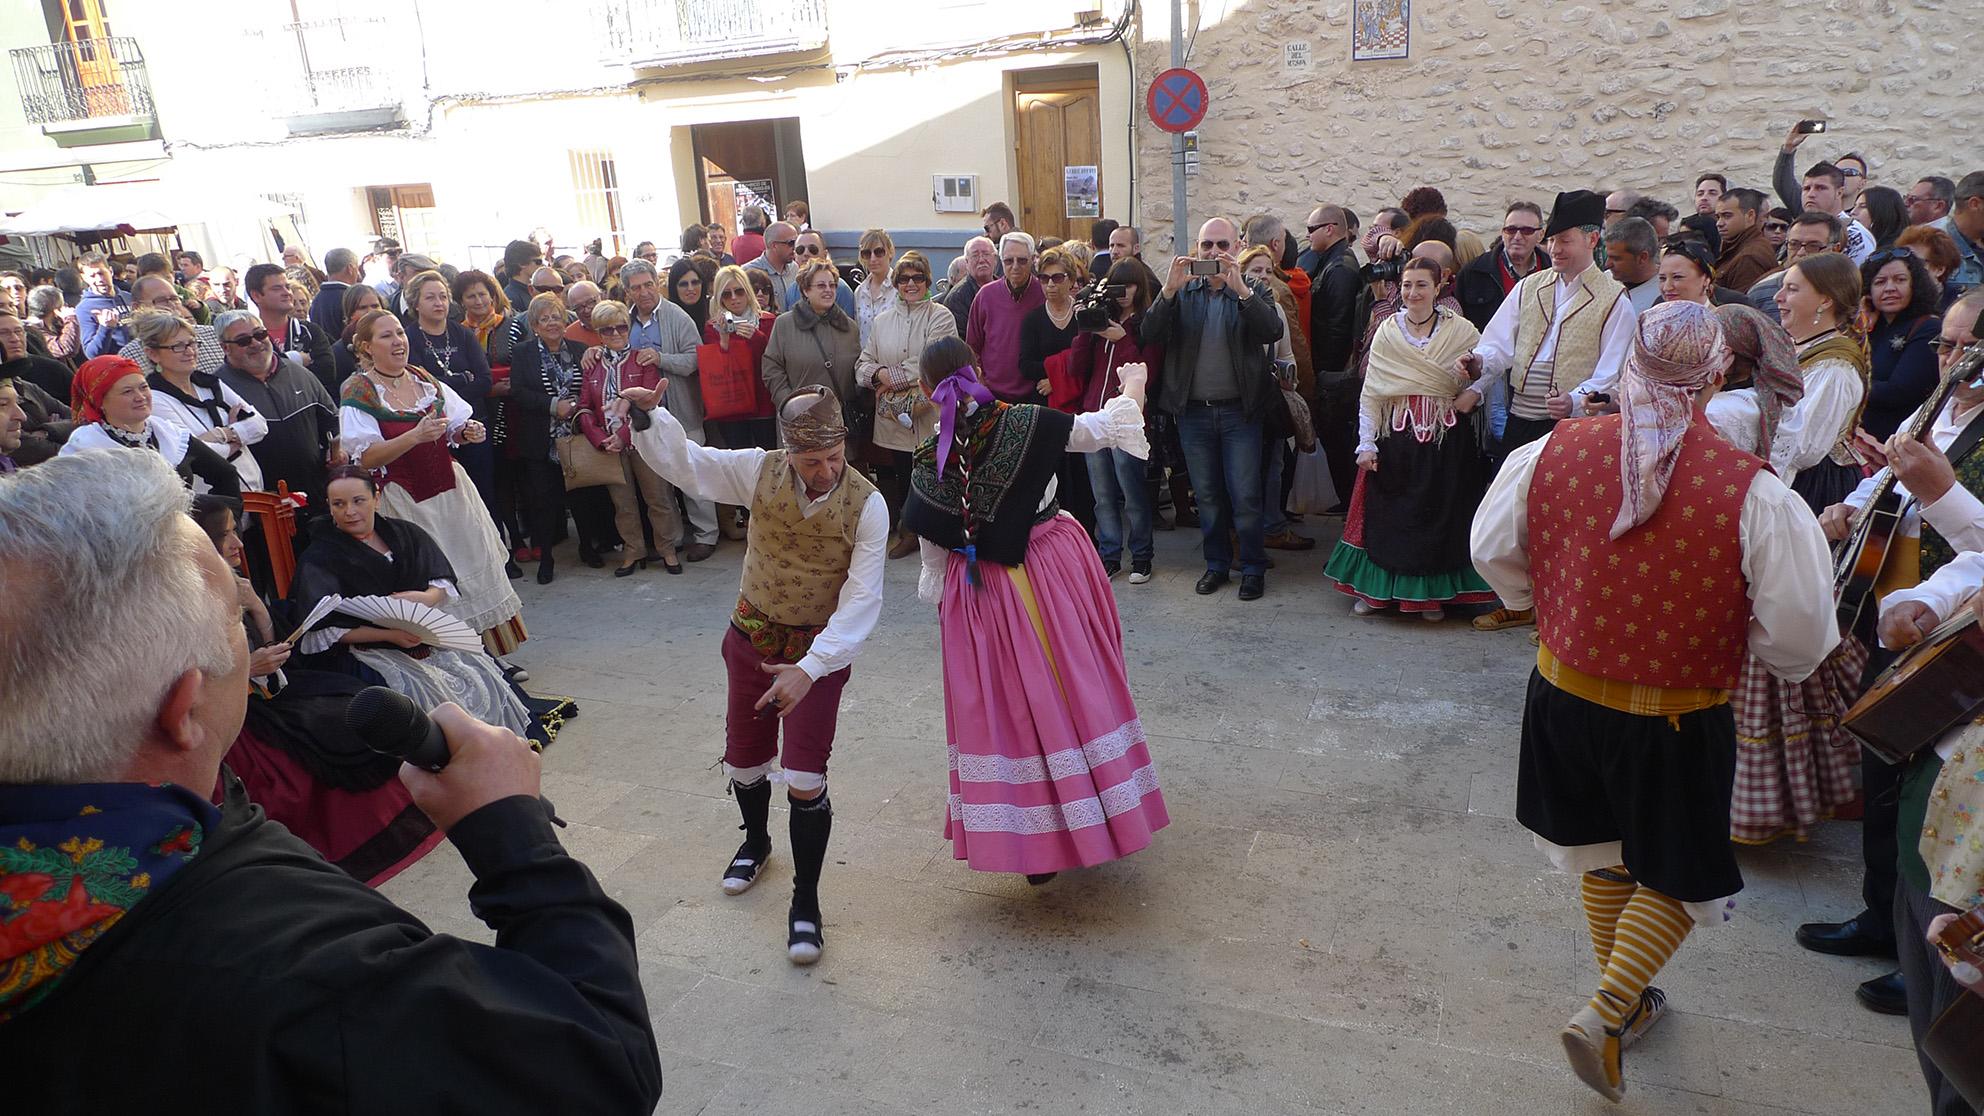 2014-02-23 - Baladre a Fira St. Marcia-ROTOVA (11)